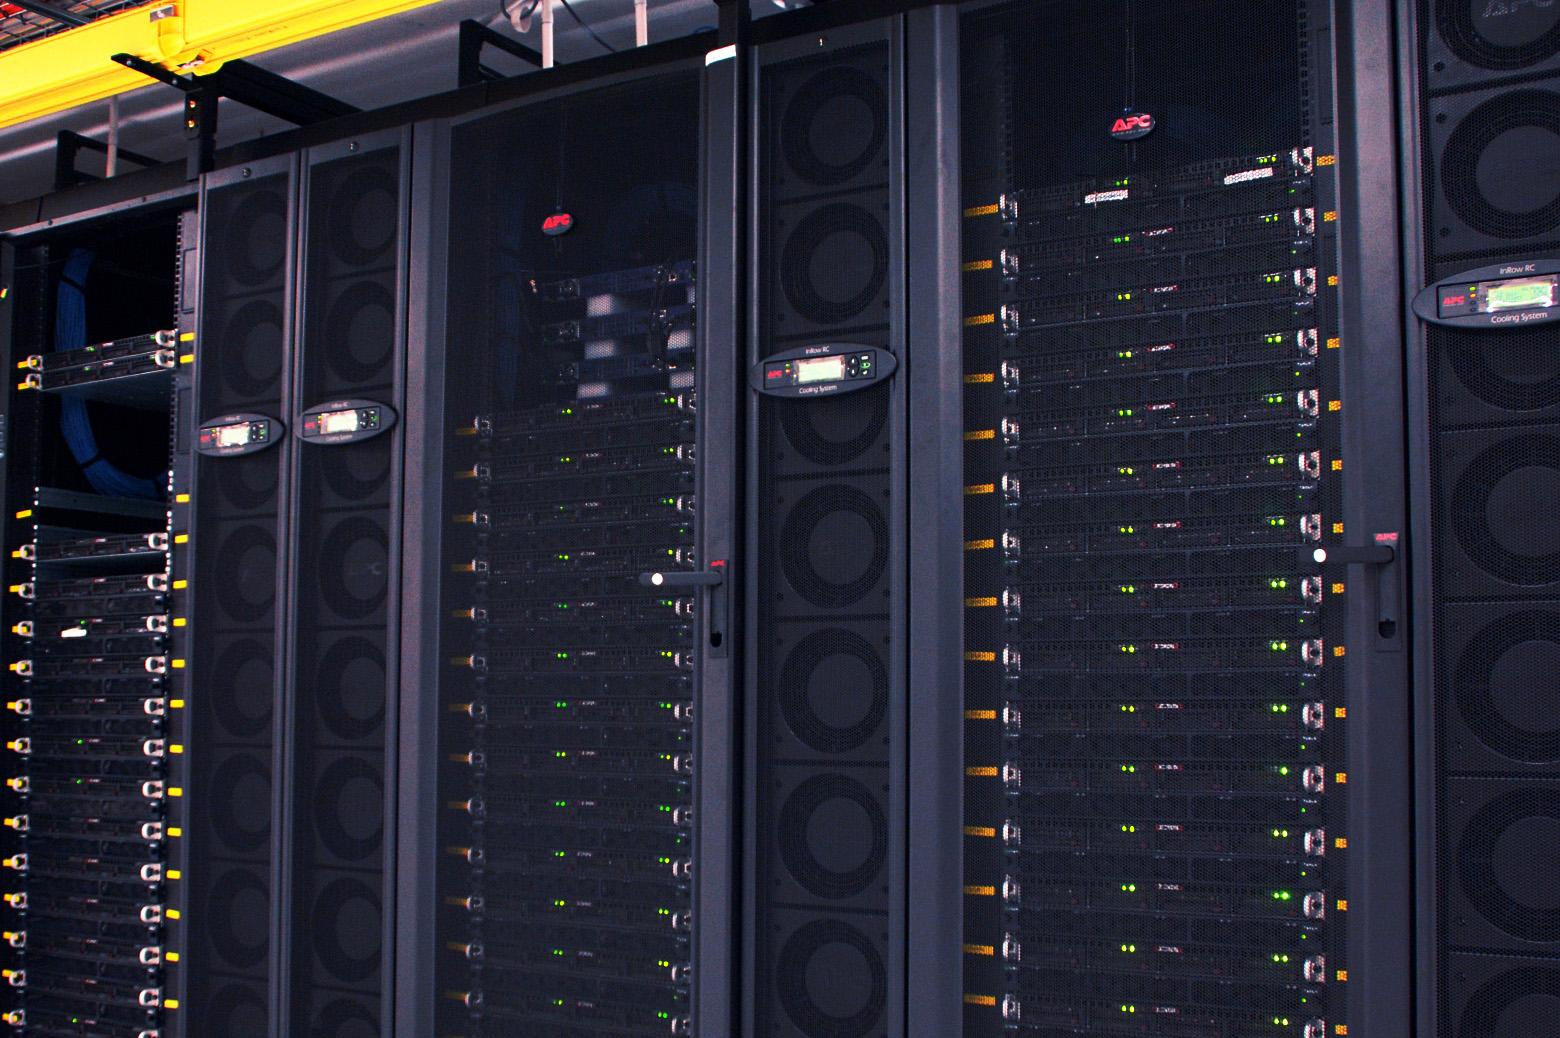 GPU cluster